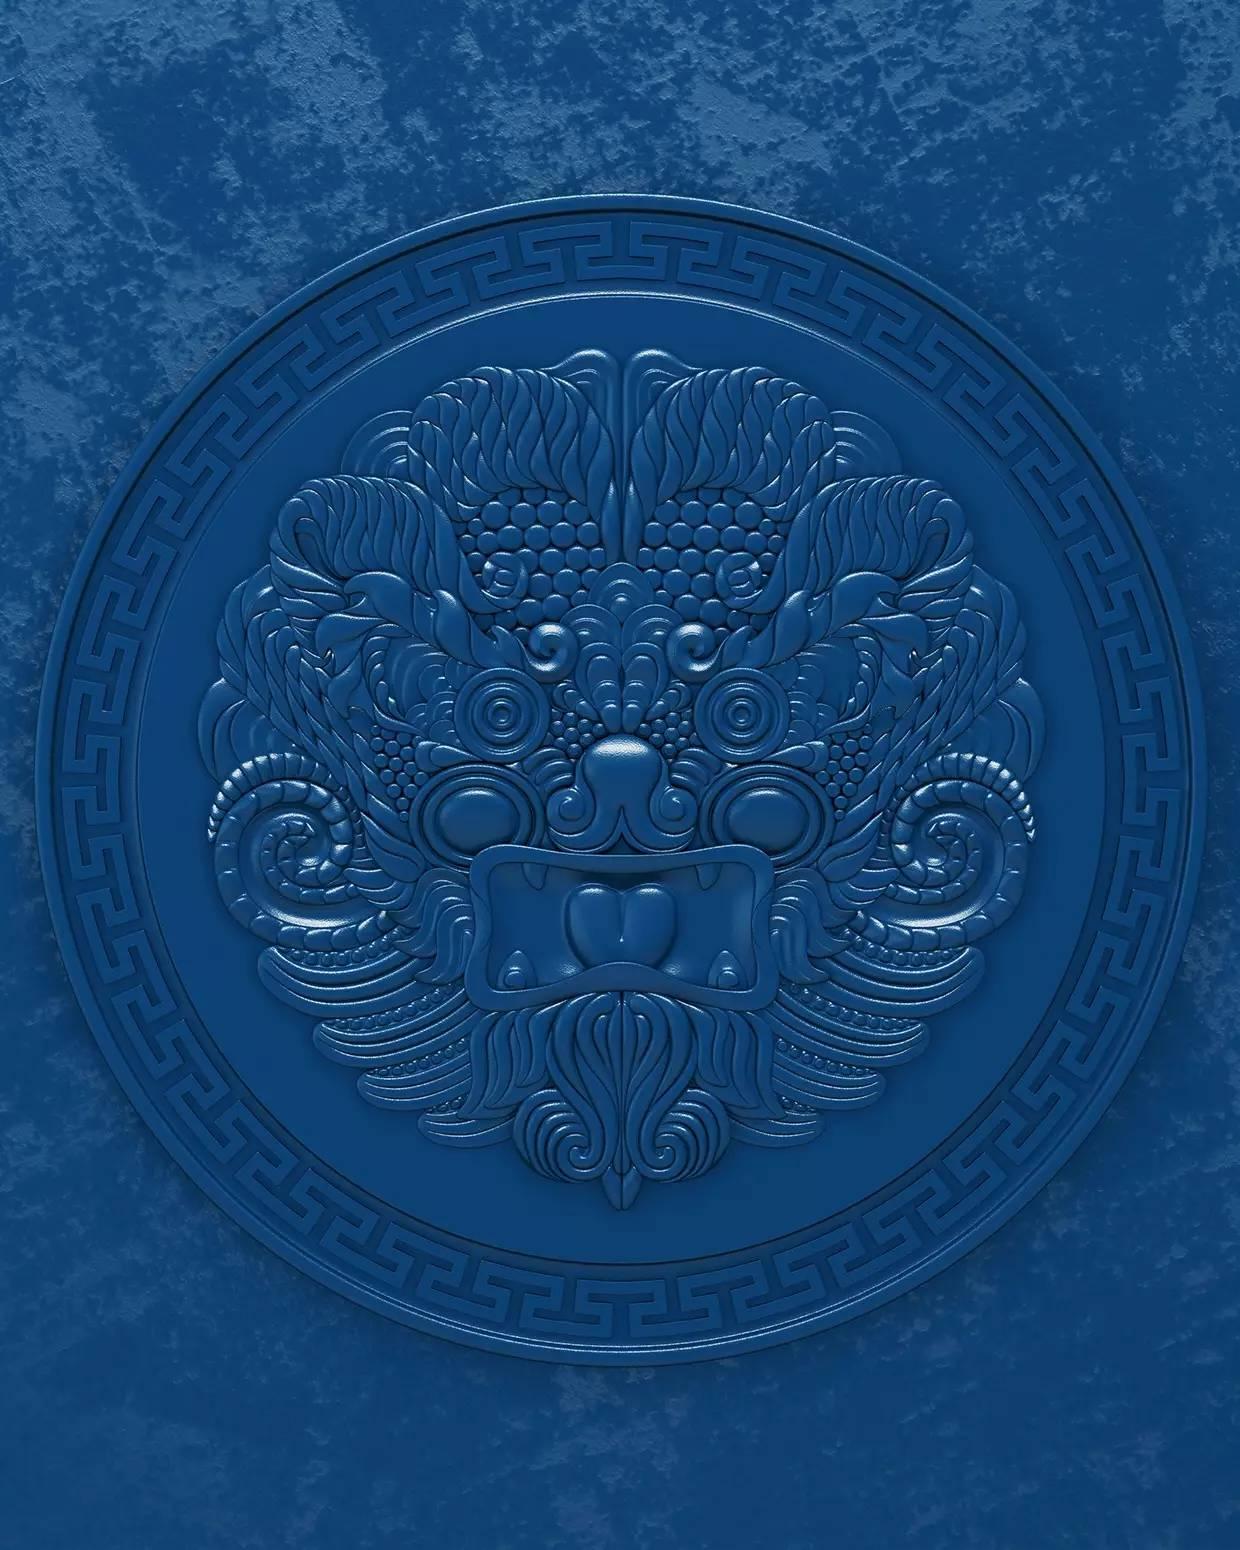 室内设计 蒙族传统装饰(Mongolian Traditional Ornament) 第12张